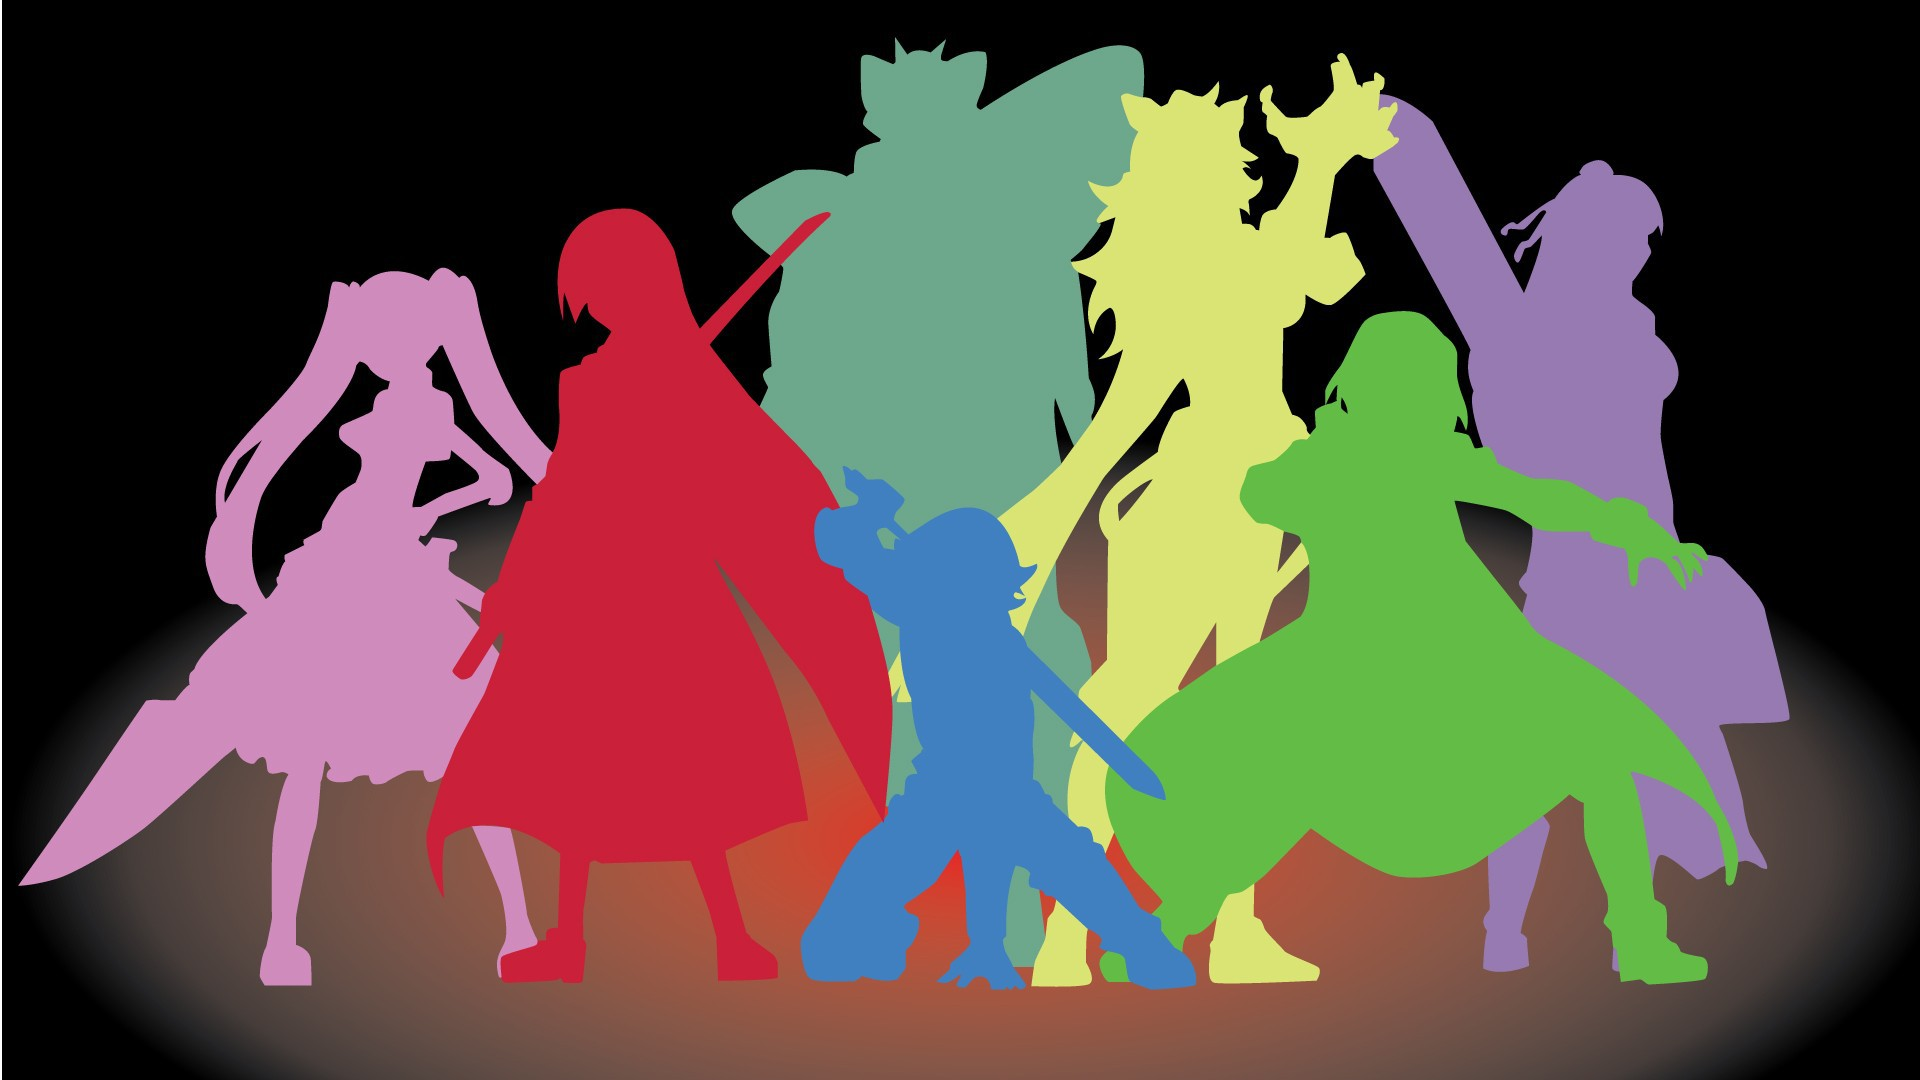 Anime Vectors Images